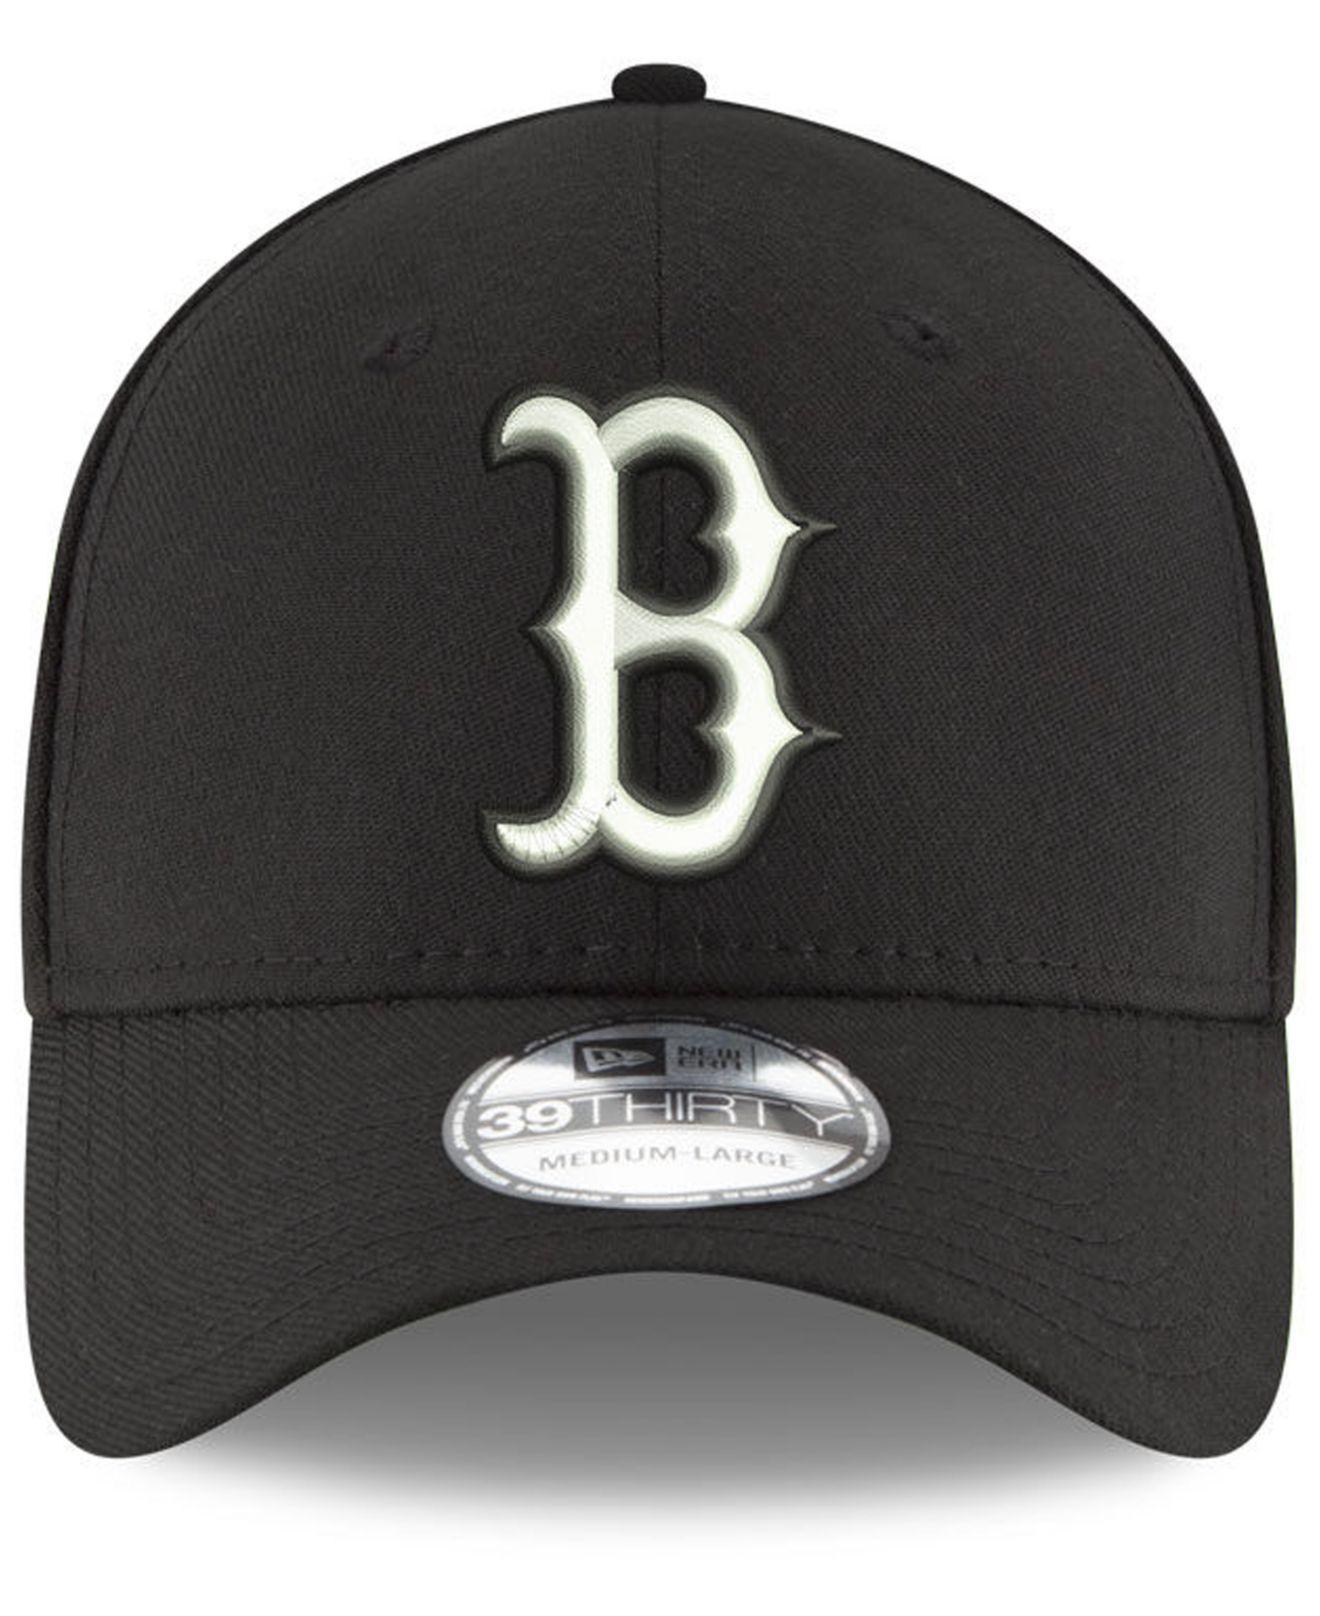 Lyst - Ktz Boston Red Sox Dub Classic 39thirty Cap in Black for Men 856743771a9e